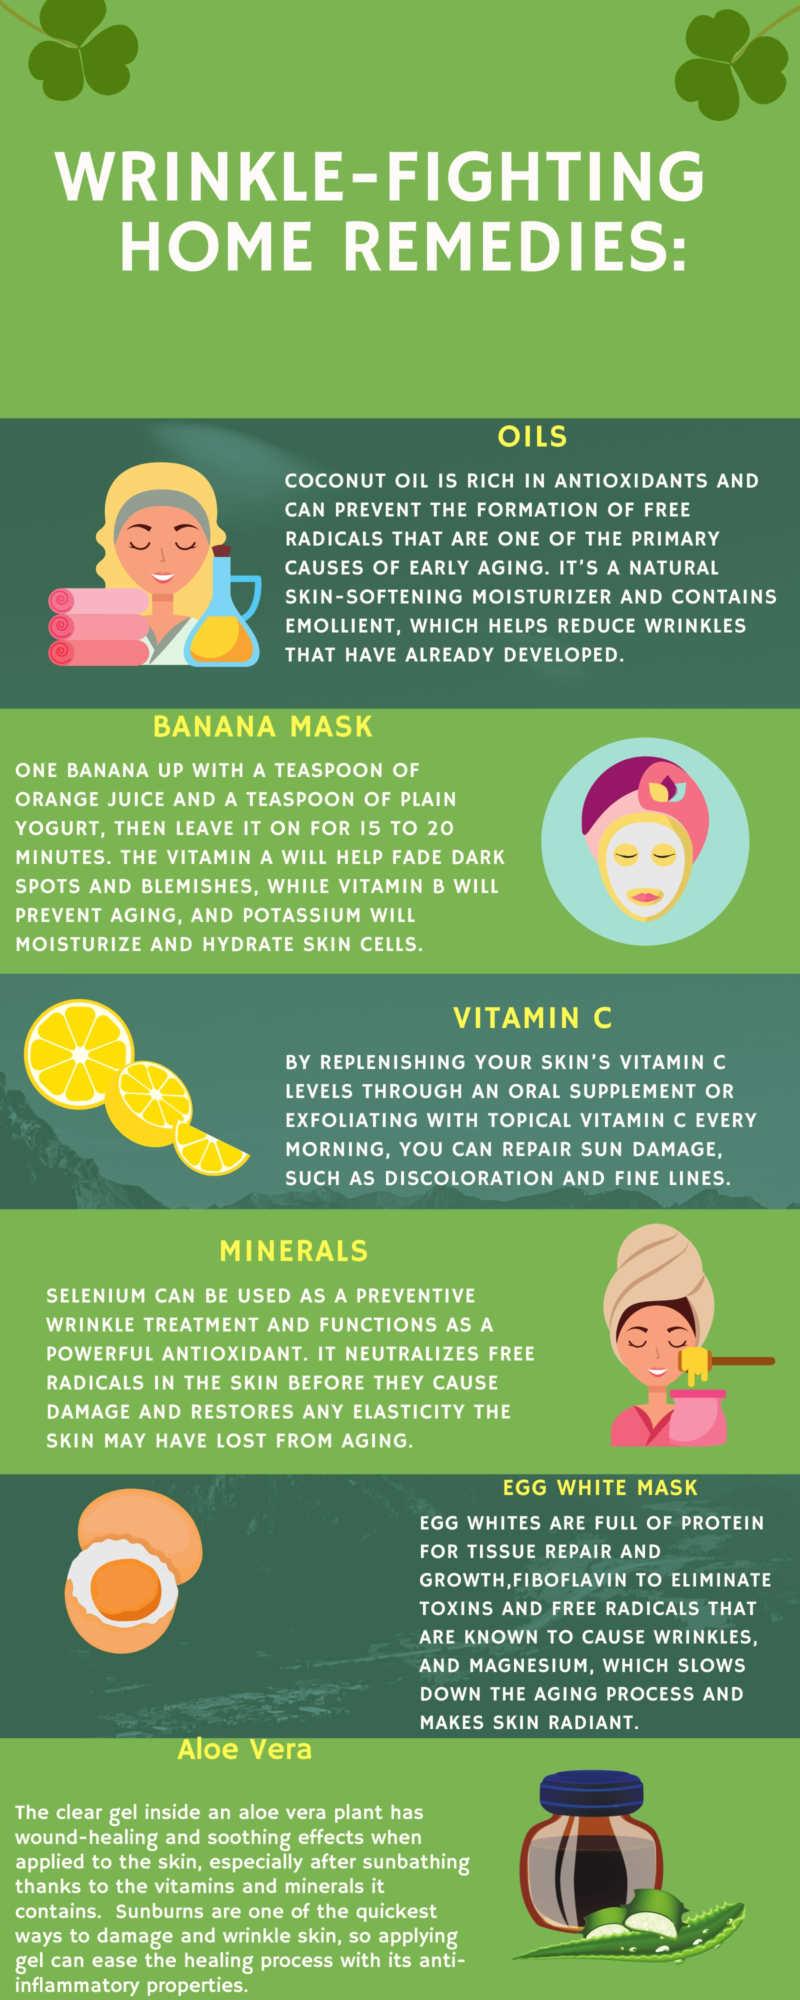 Wrinkle-Fighting Home Remedies: